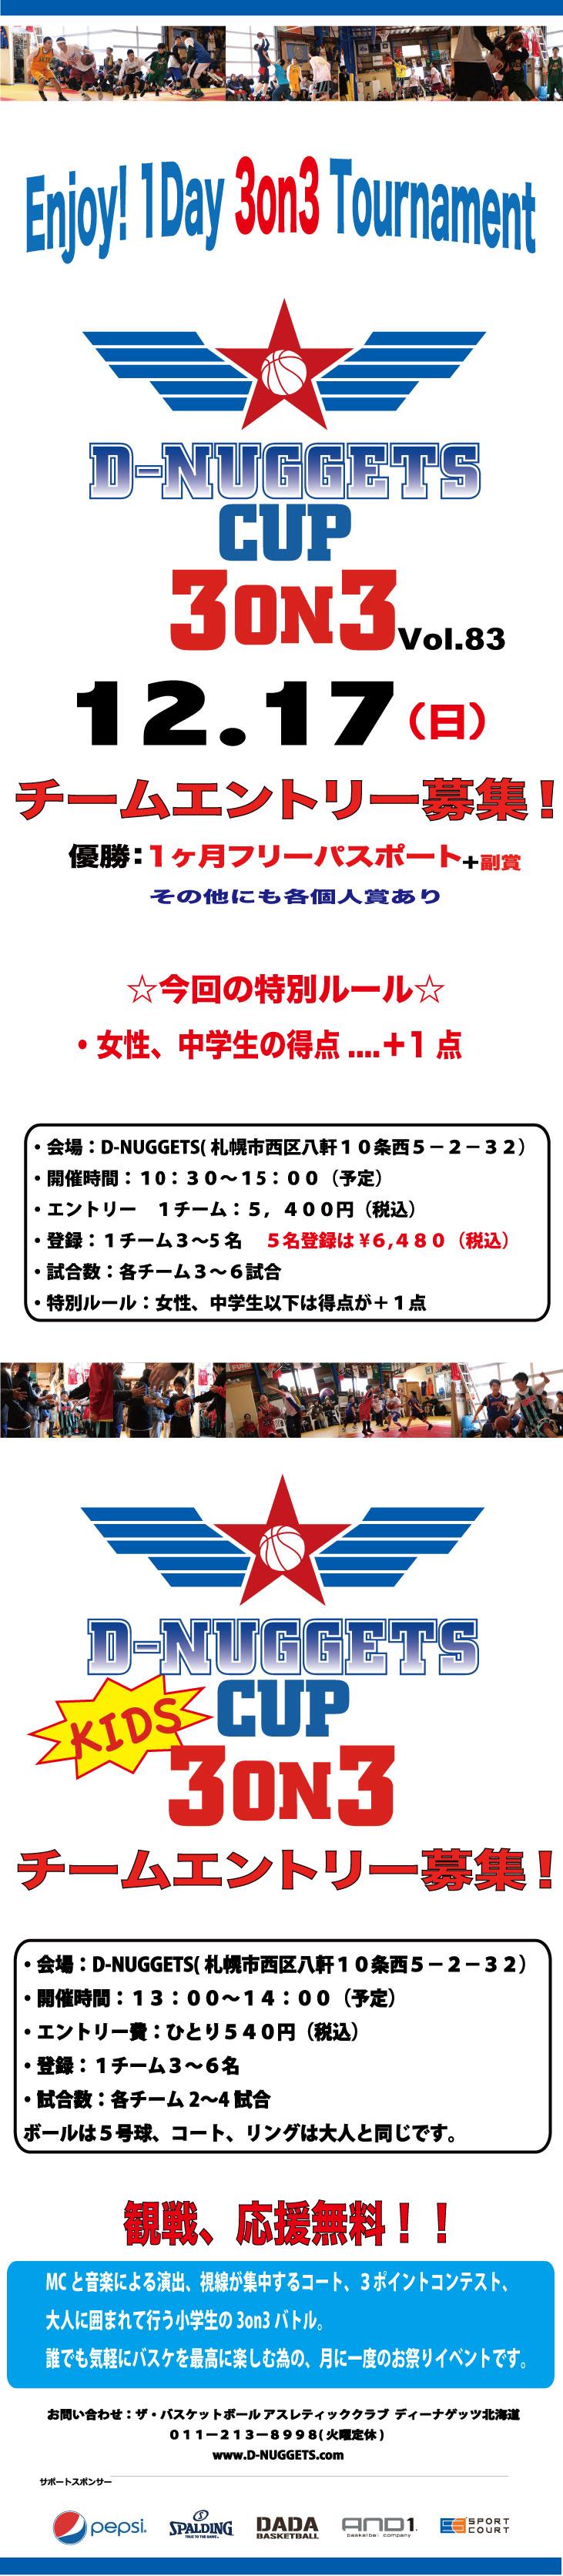 D-NUGGETS-CUP-HOKKAIDO-Vol.83.jpg